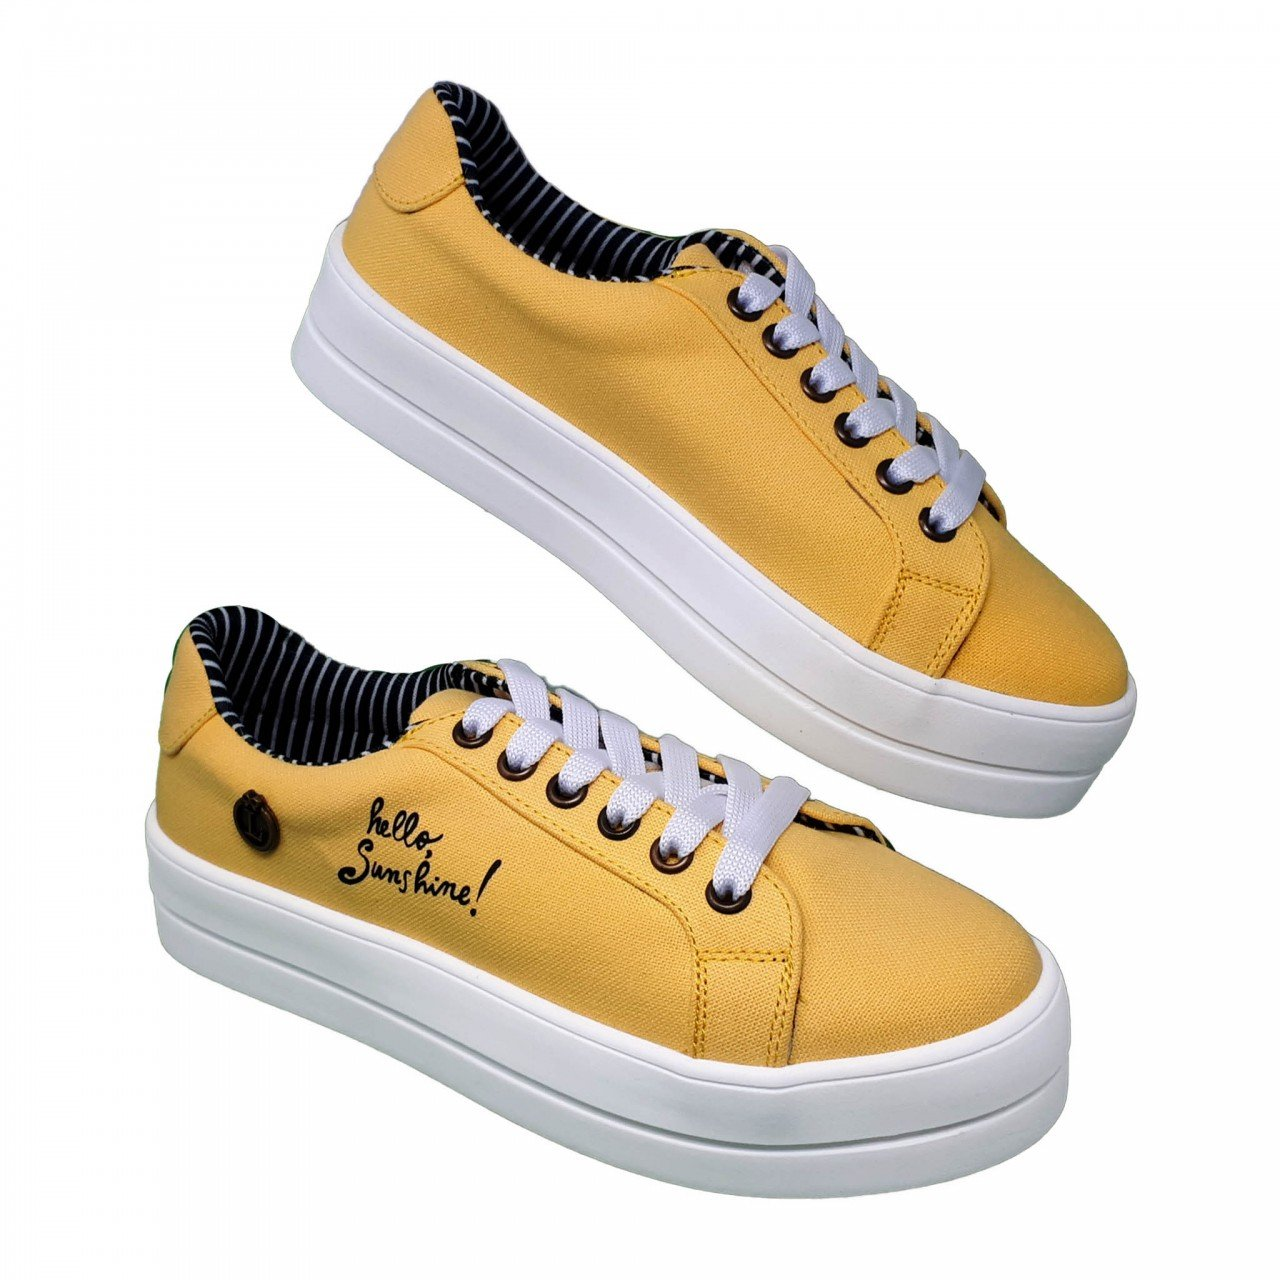 Tenis amarillo para mujer Salma Loly in the sky